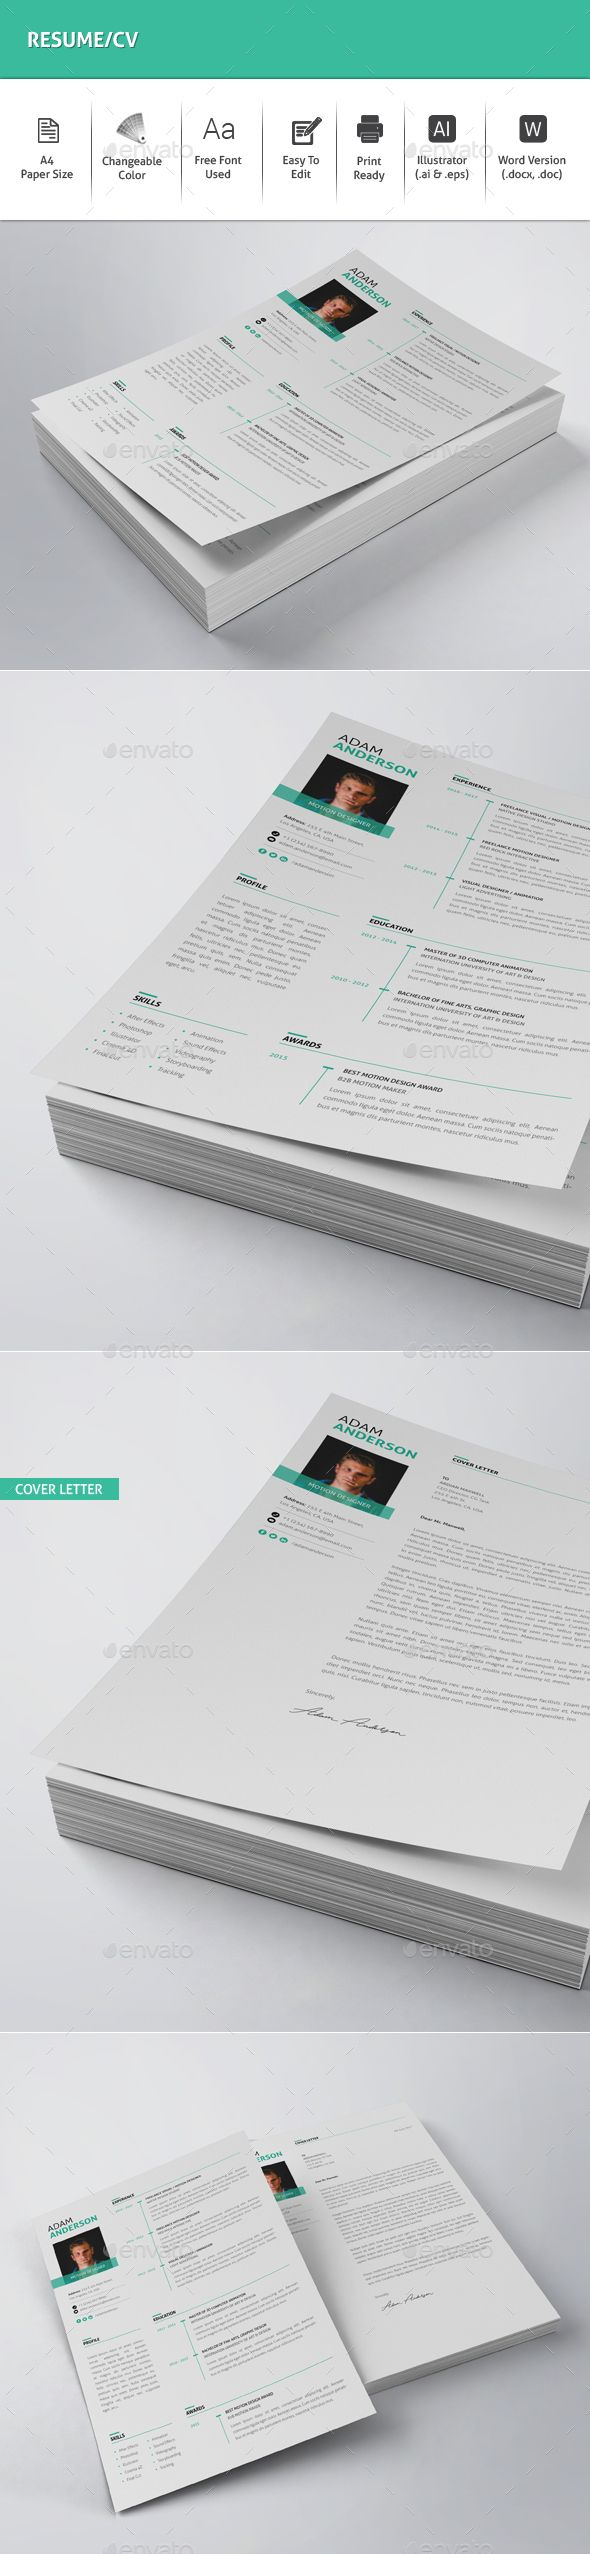 Microsoft Word Templates Cv%0A Resume CV